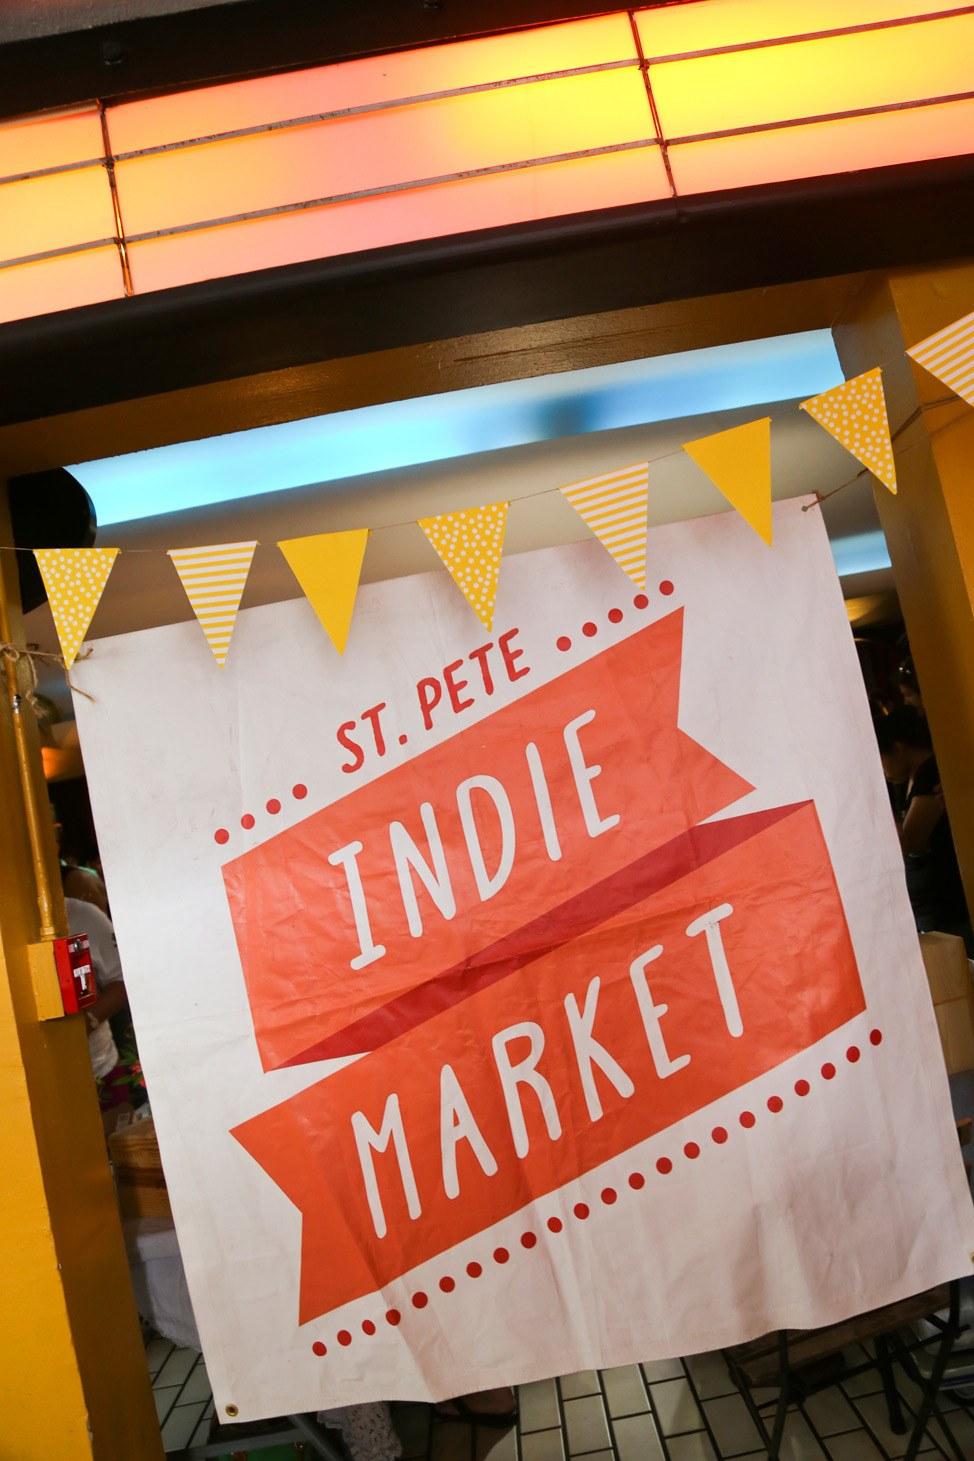 Indie Market St. Pete Florida